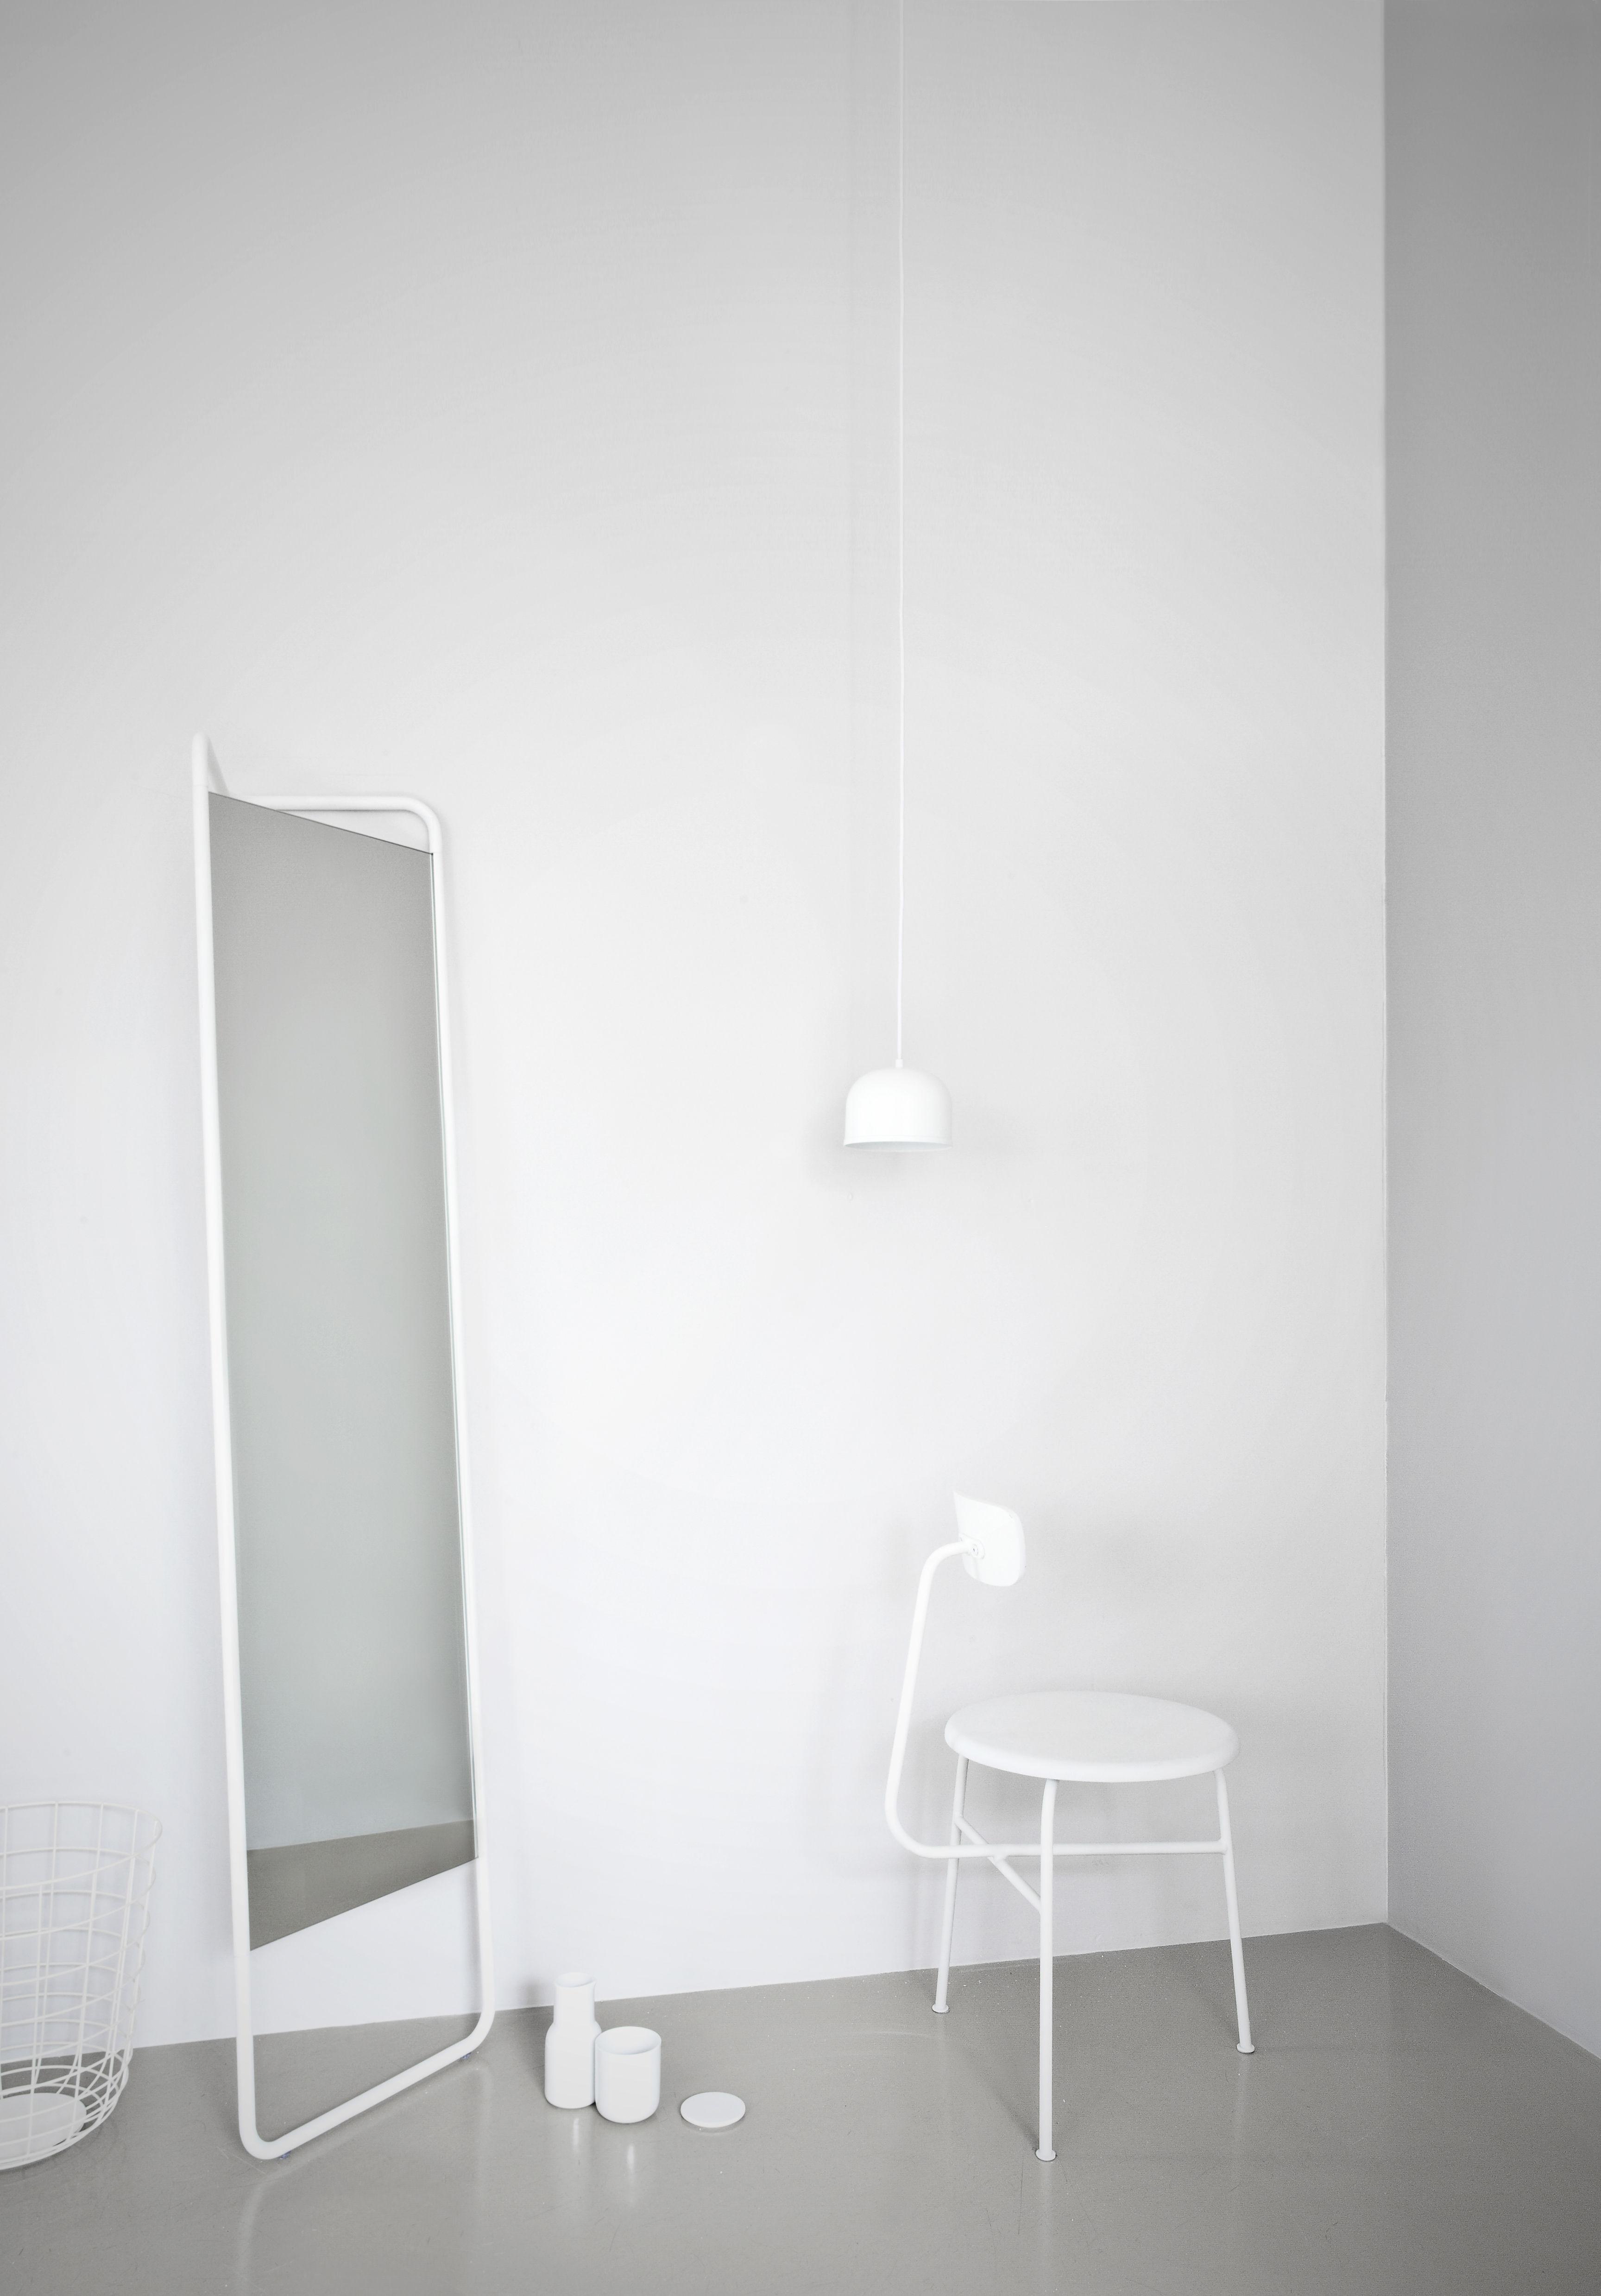 miroir sur pied kaschkasch menu blanc l 42 x h 175 made in design. Black Bedroom Furniture Sets. Home Design Ideas